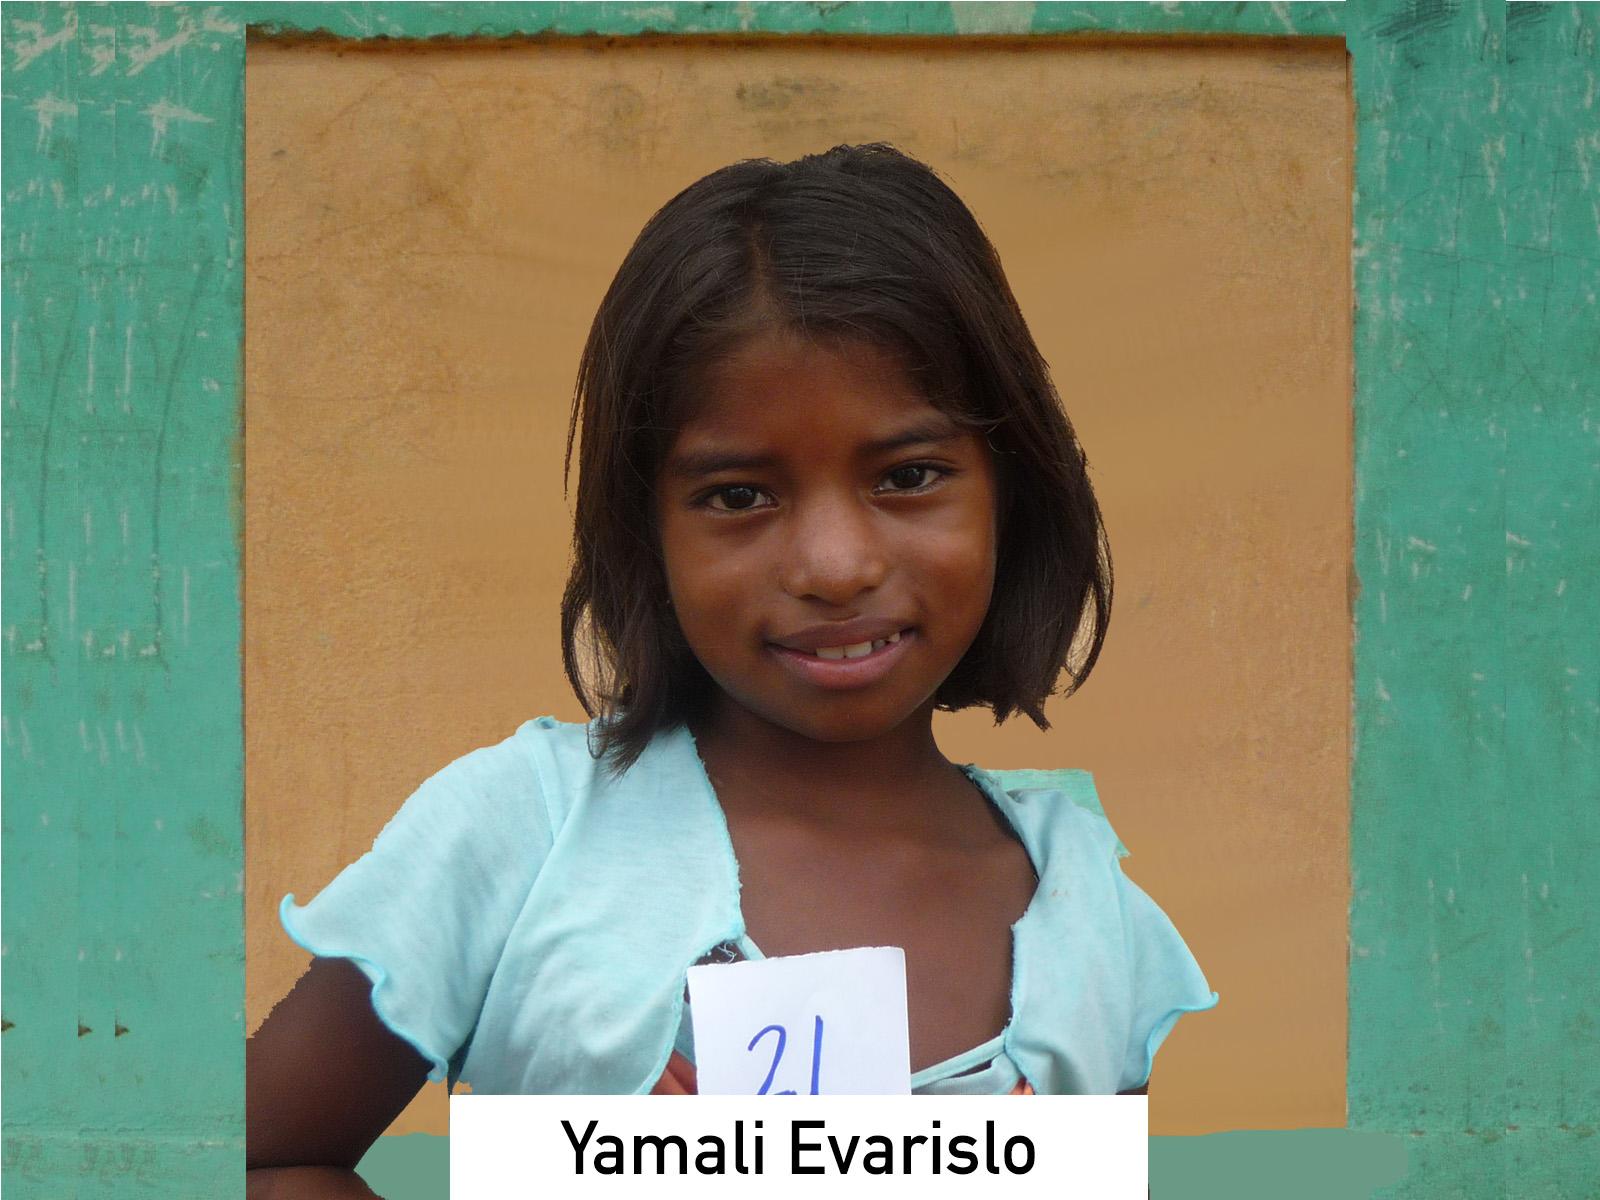 021 - Yamali Evarislo.jpg